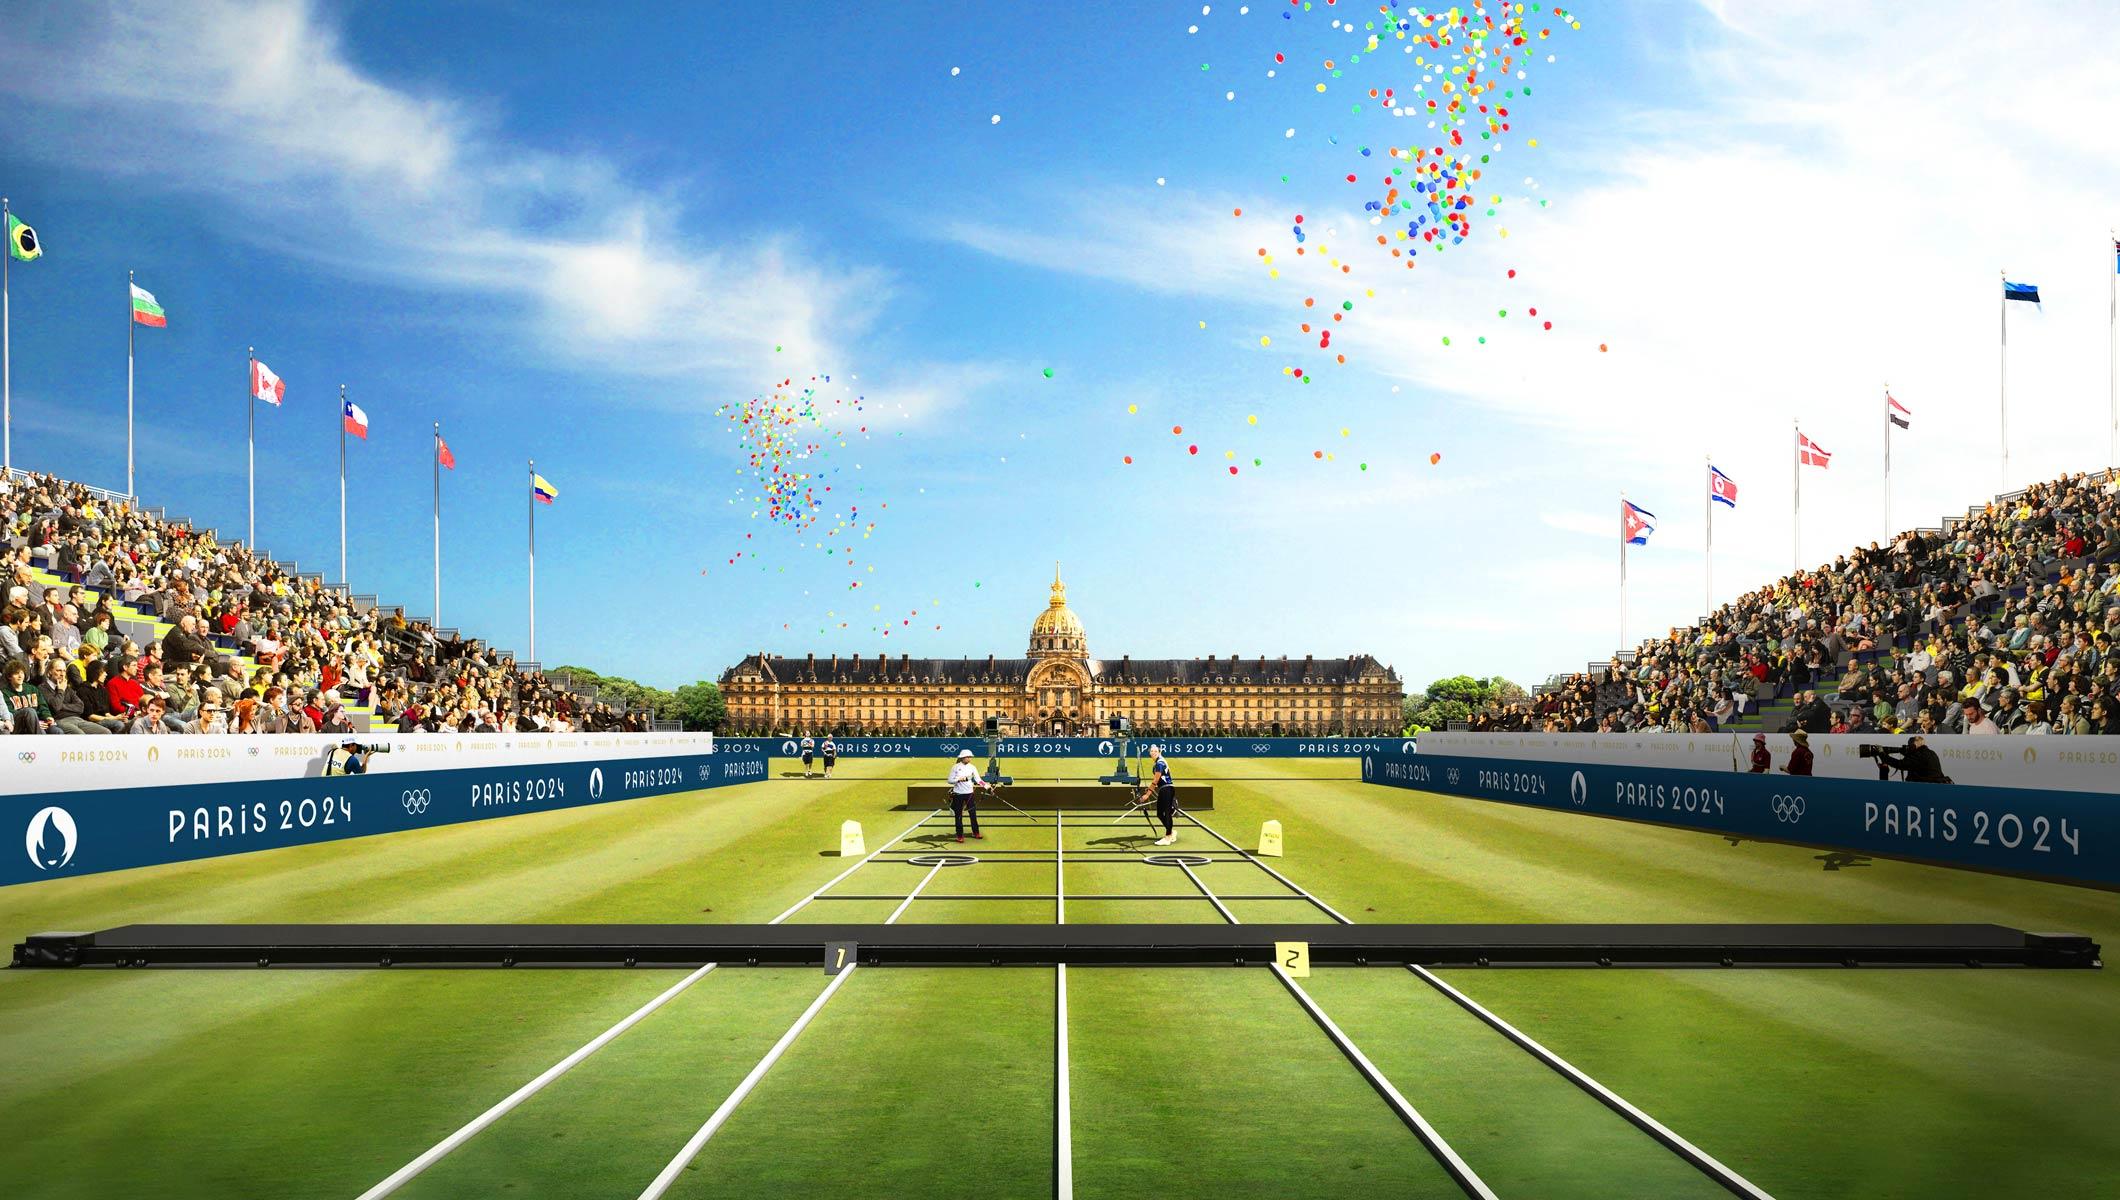 IOC Executive Board confirms timeline for Paris 20 events ...